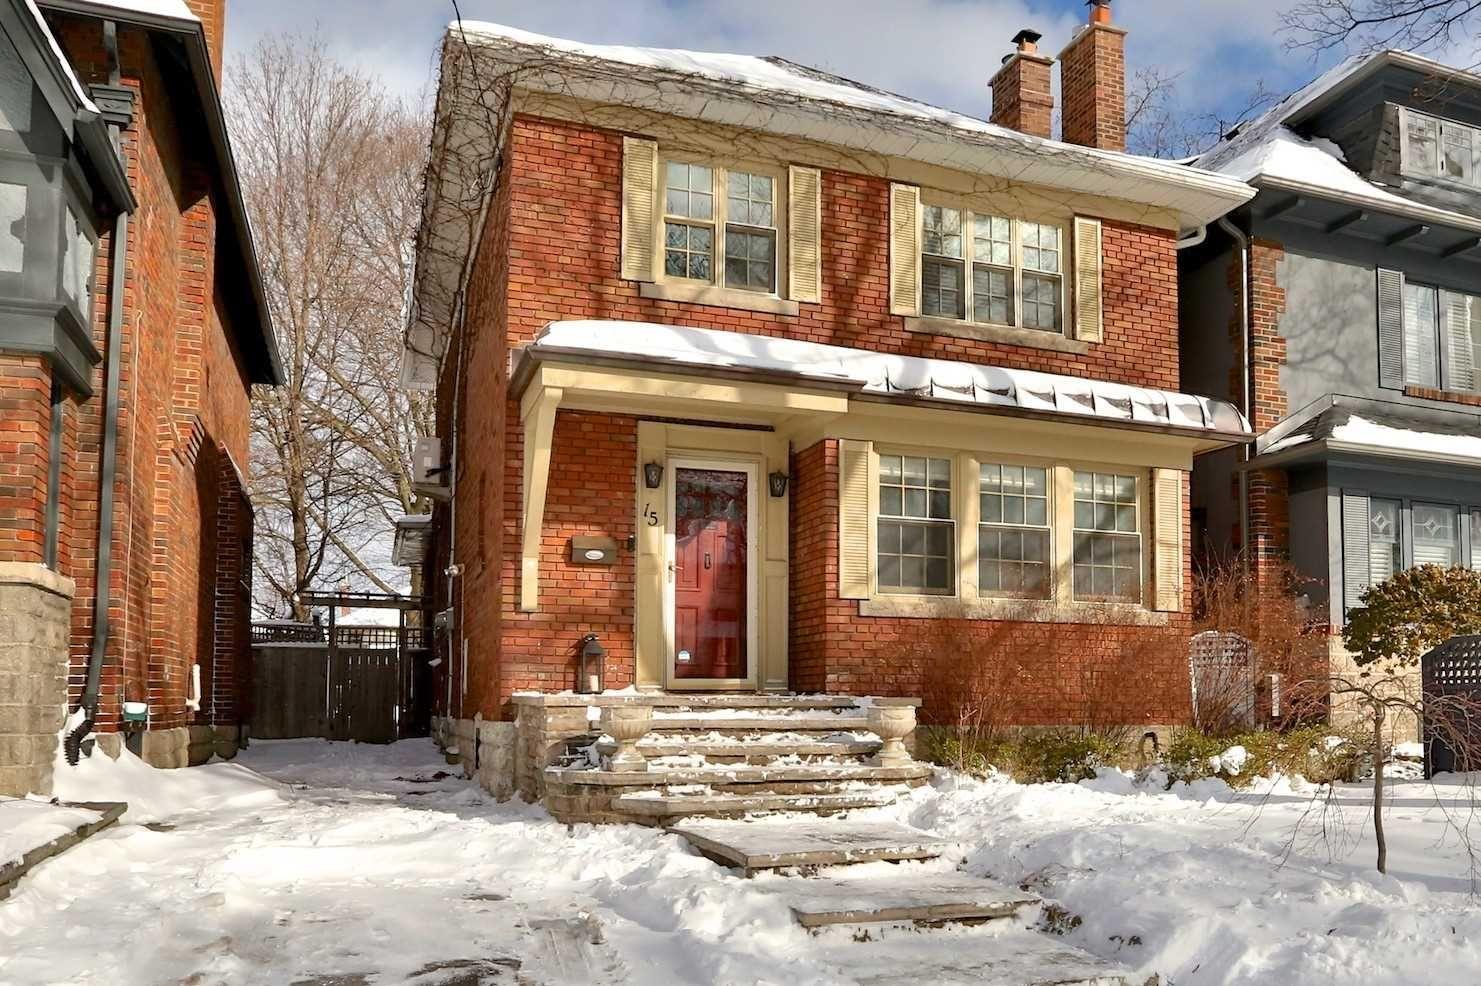 Main Photo: 15 Glen Castle Street in Toronto: Lawrence Park South House (2-Storey) for sale (Toronto C04)  : MLS®# C4704094